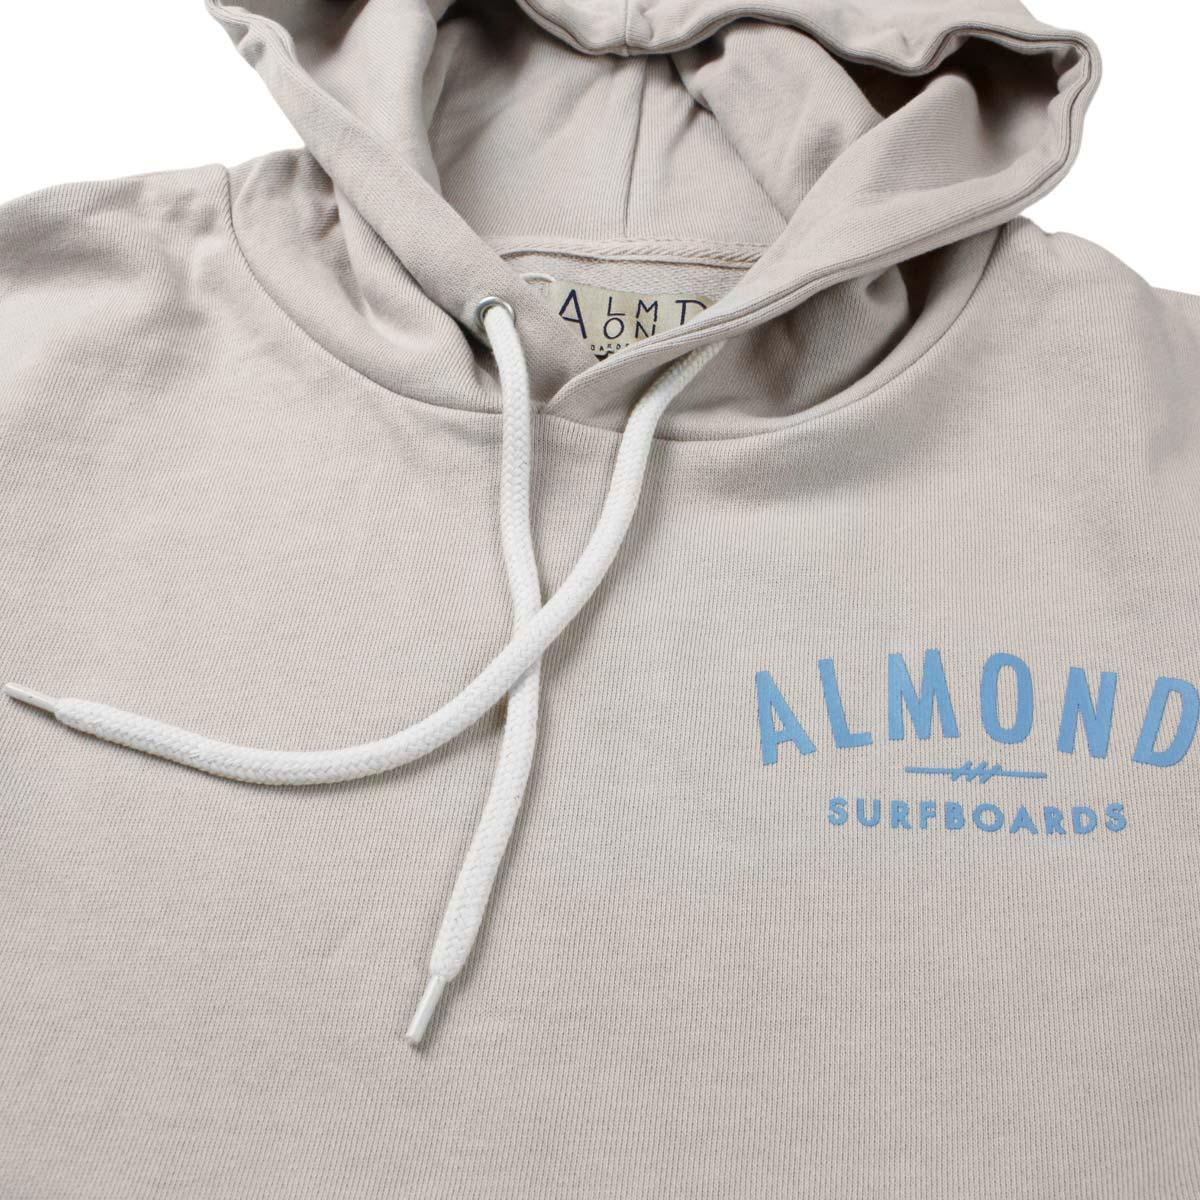 Almond Surf アーモンドサーフボードデザイン FINESURFING A